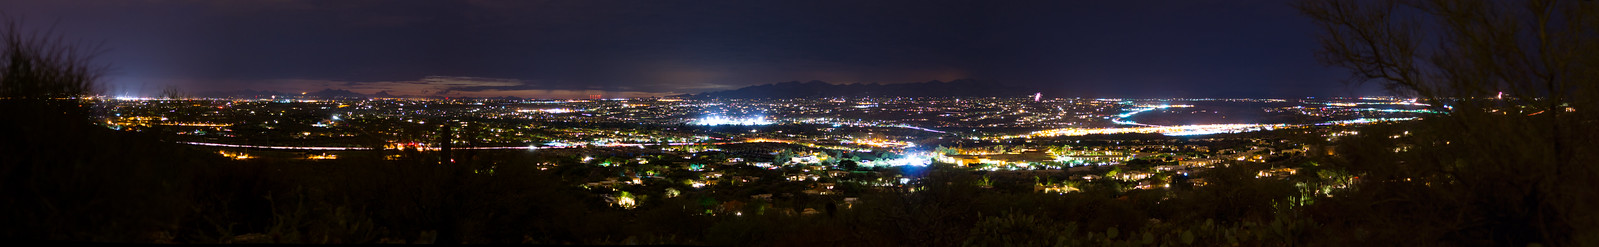 1507 July 4th Tucson from near the Linda Vista Trail